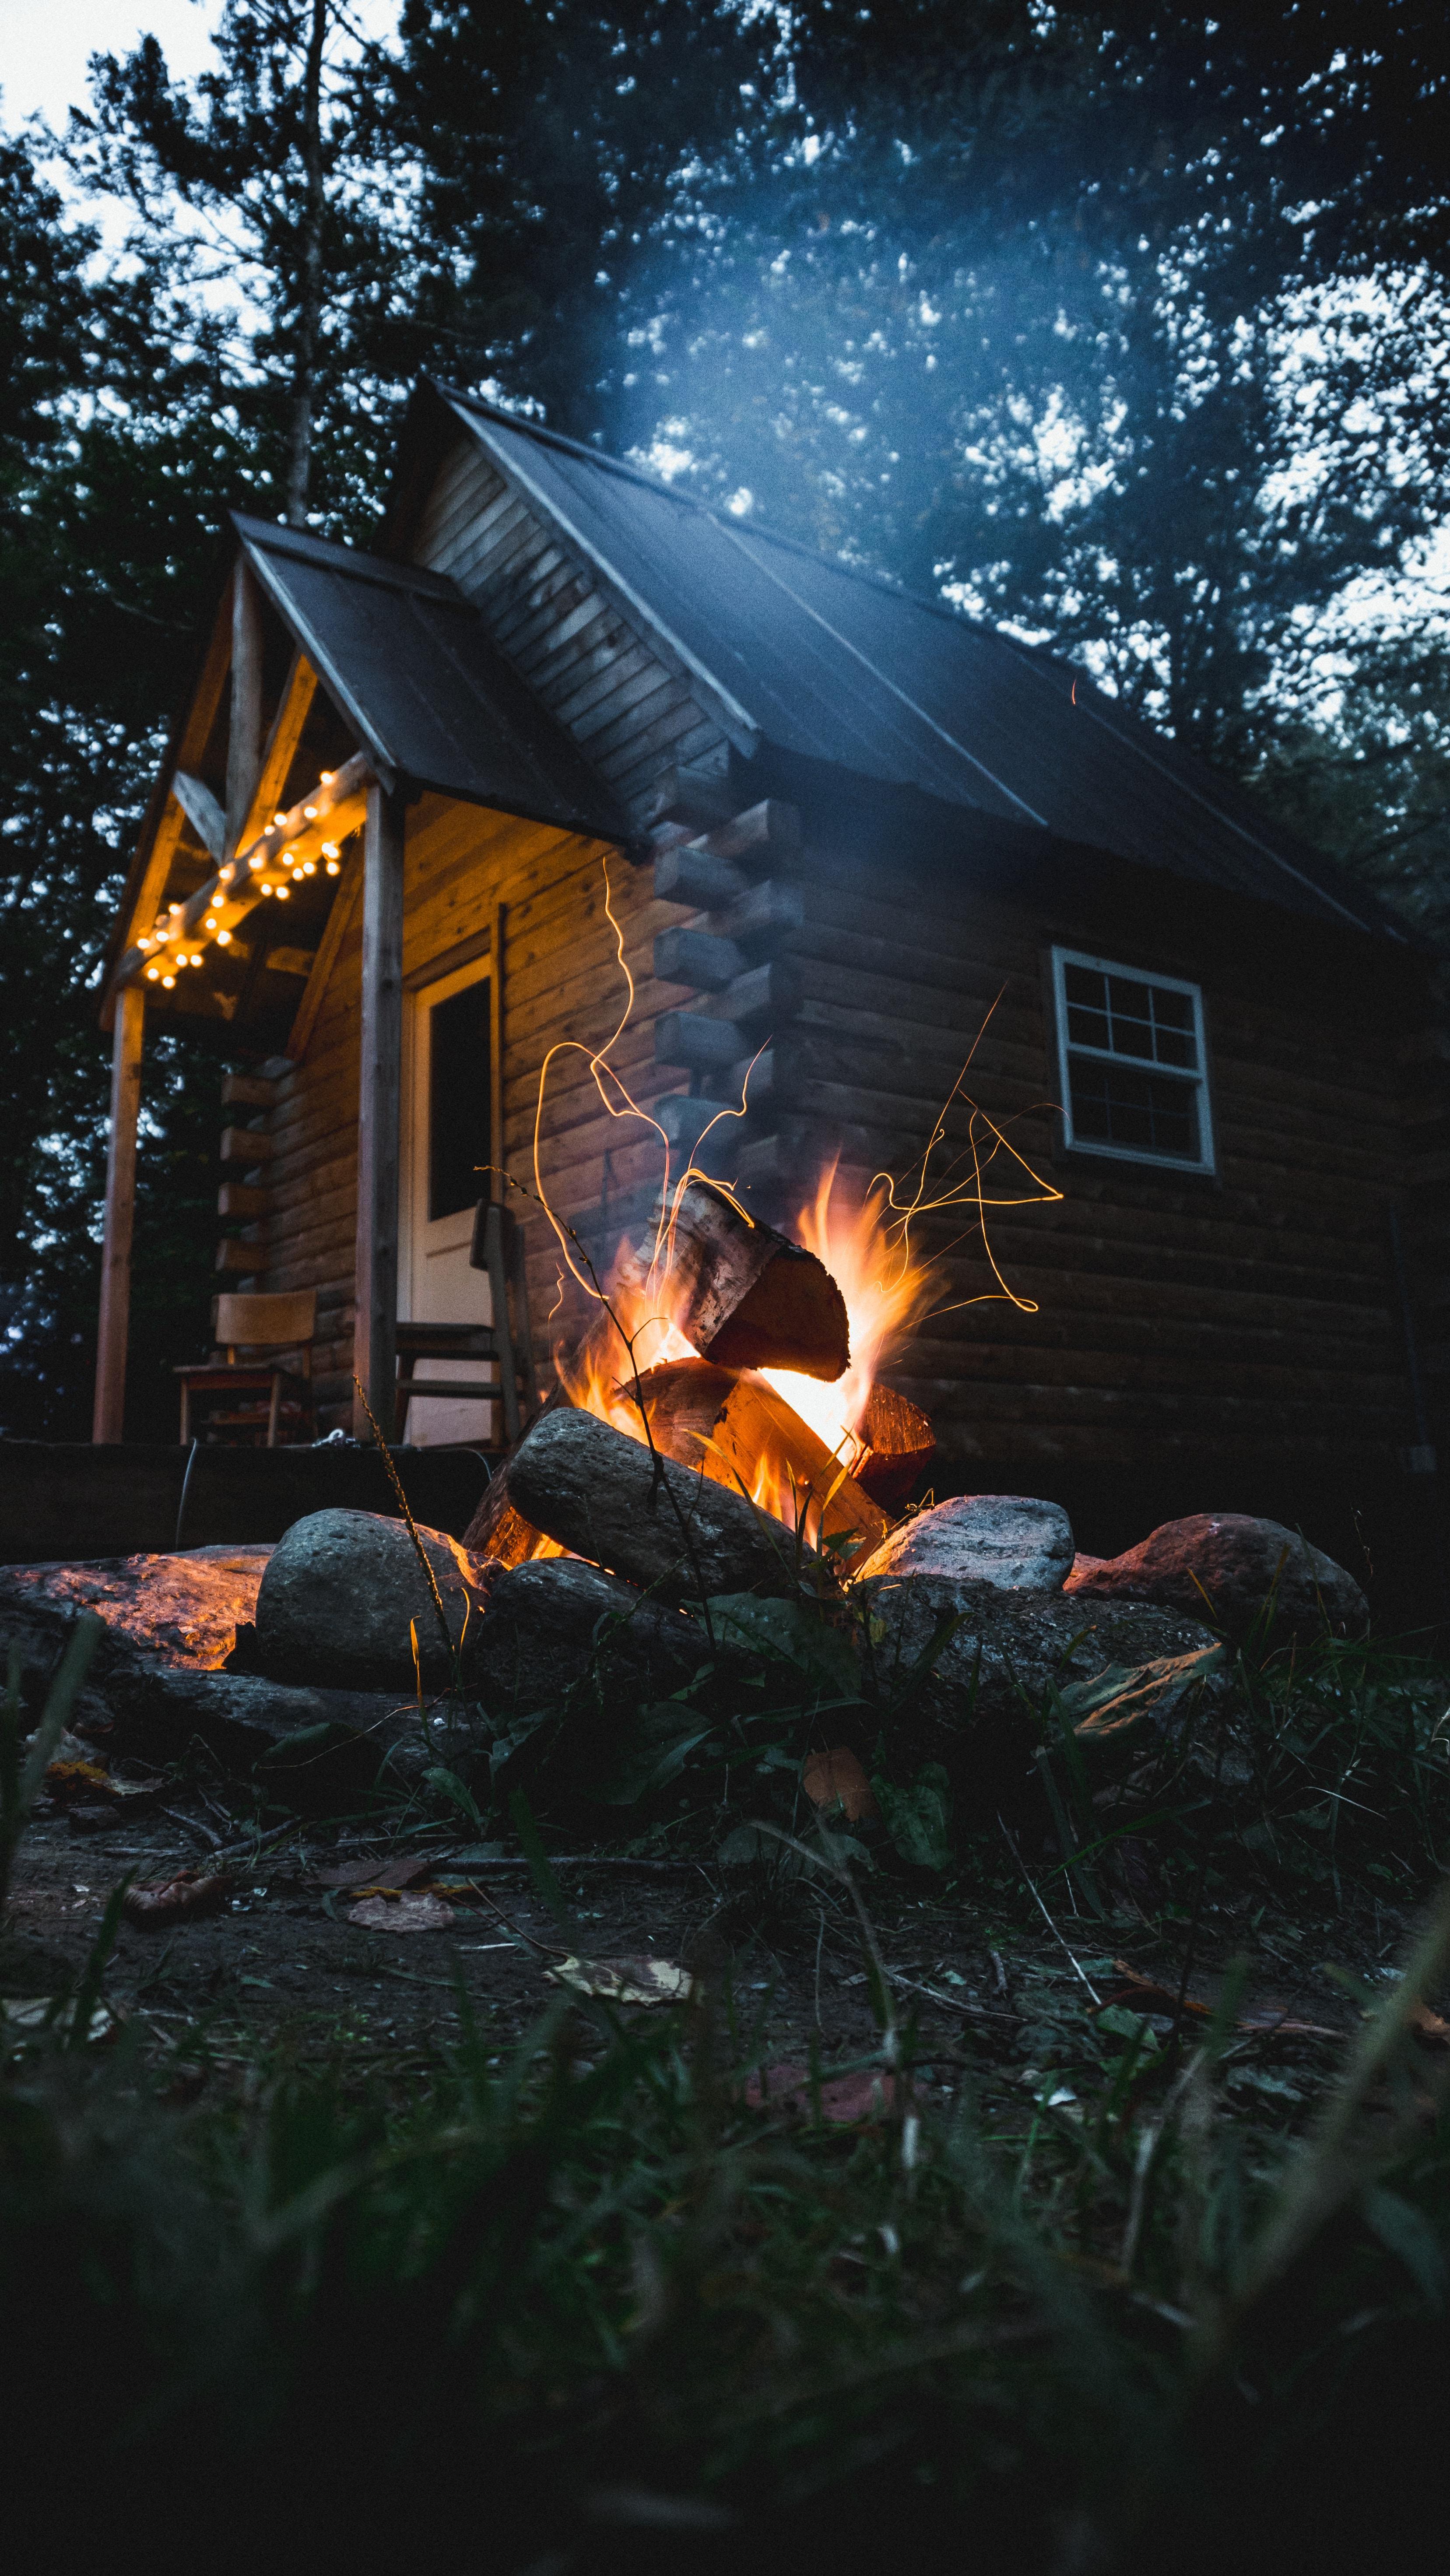 bonfire nearby house